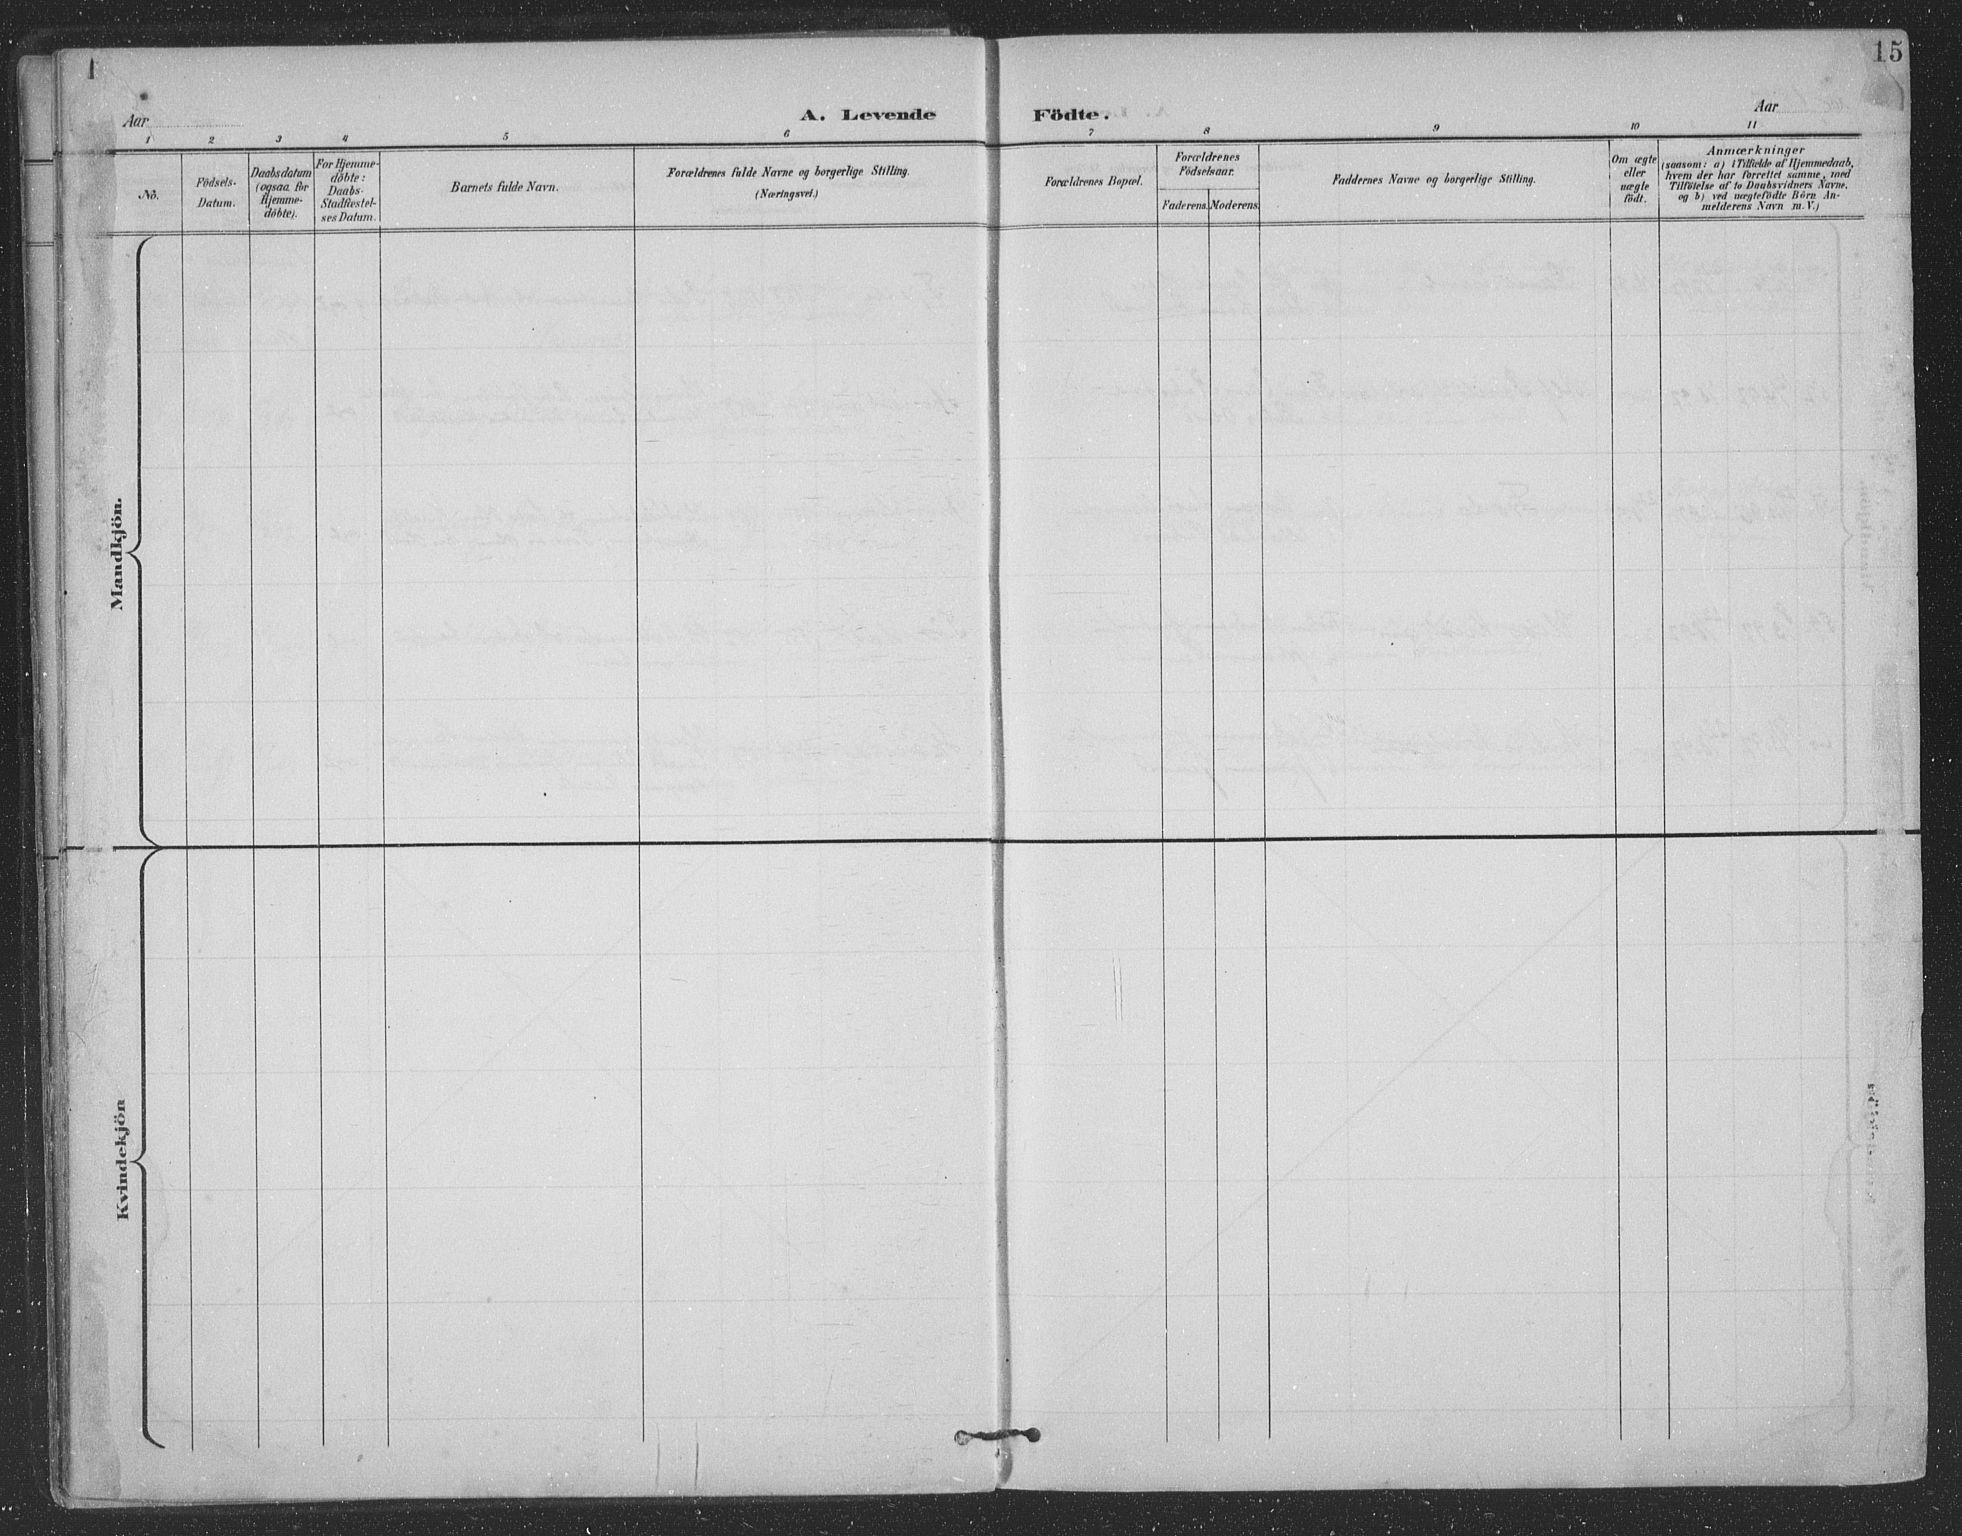 SAT, Ministerialprotokoller, klokkerbøker og fødselsregistre - Nordland, 863/L0899: Ministerialbok nr. 863A11, 1897-1906, s. 15